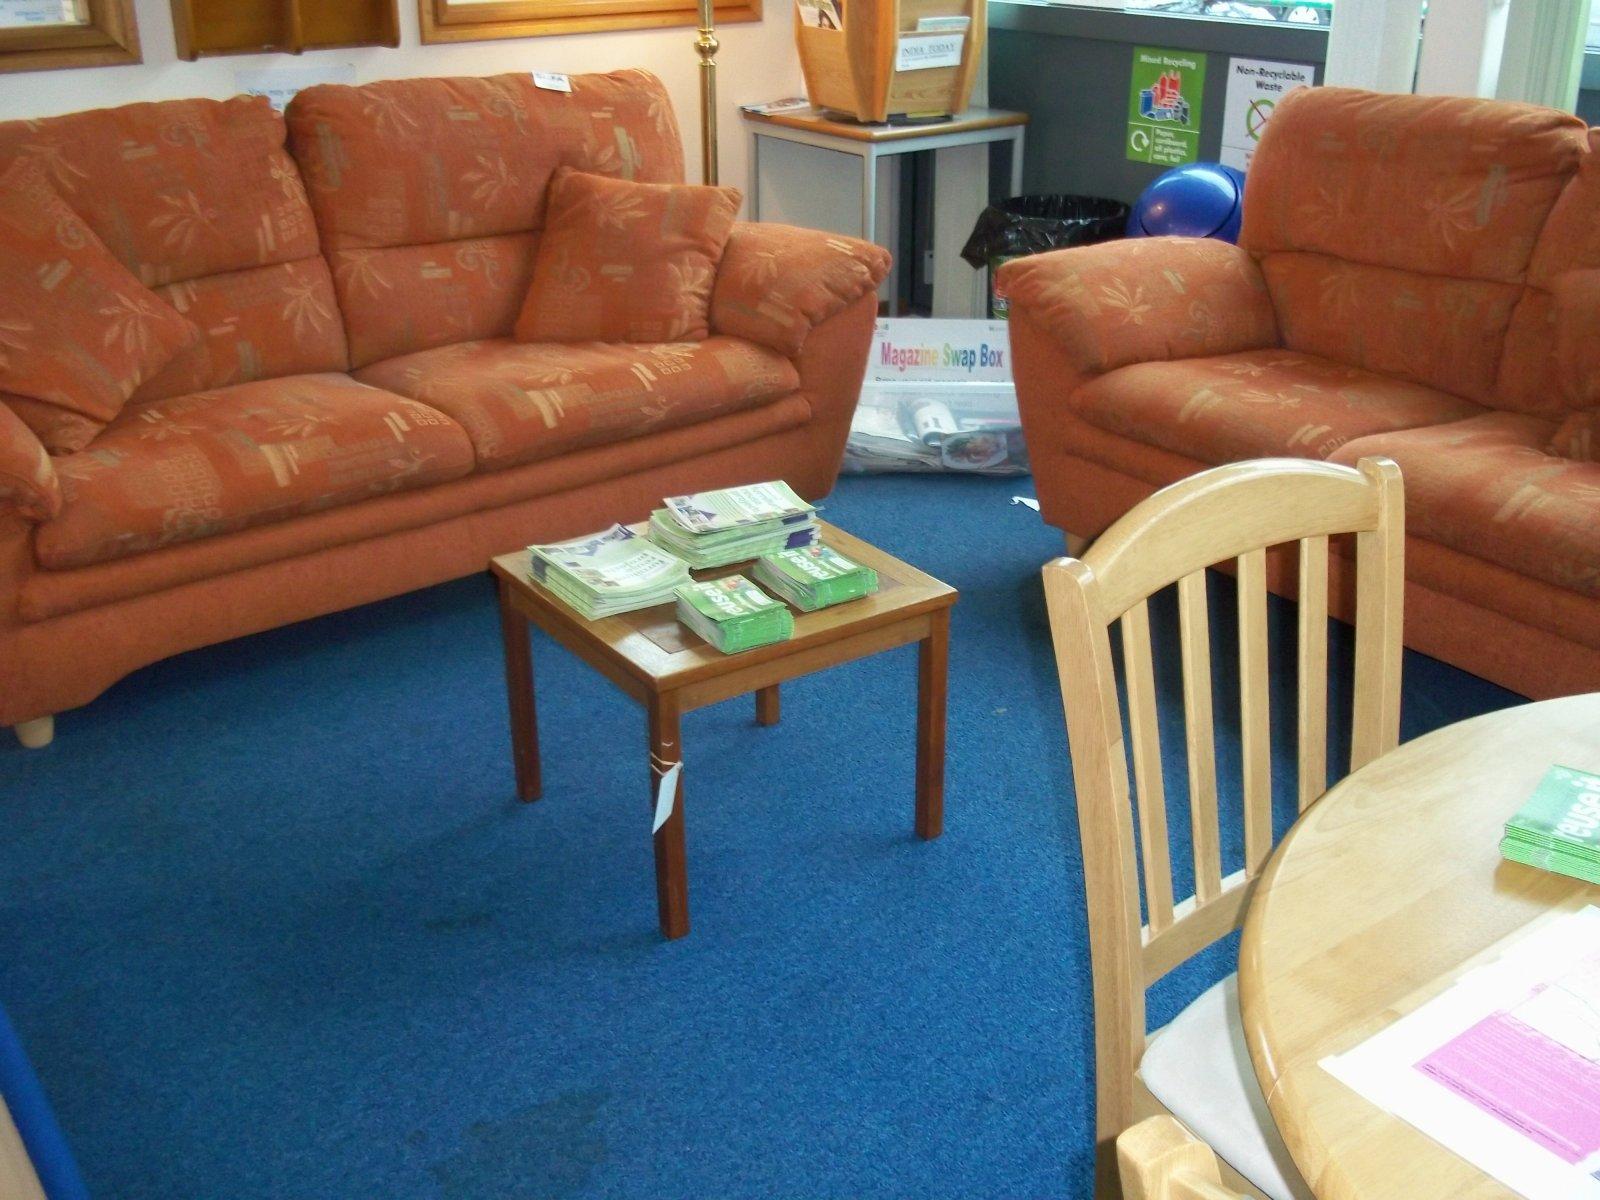 sofa - sofa furniture in loughborough library march 2012